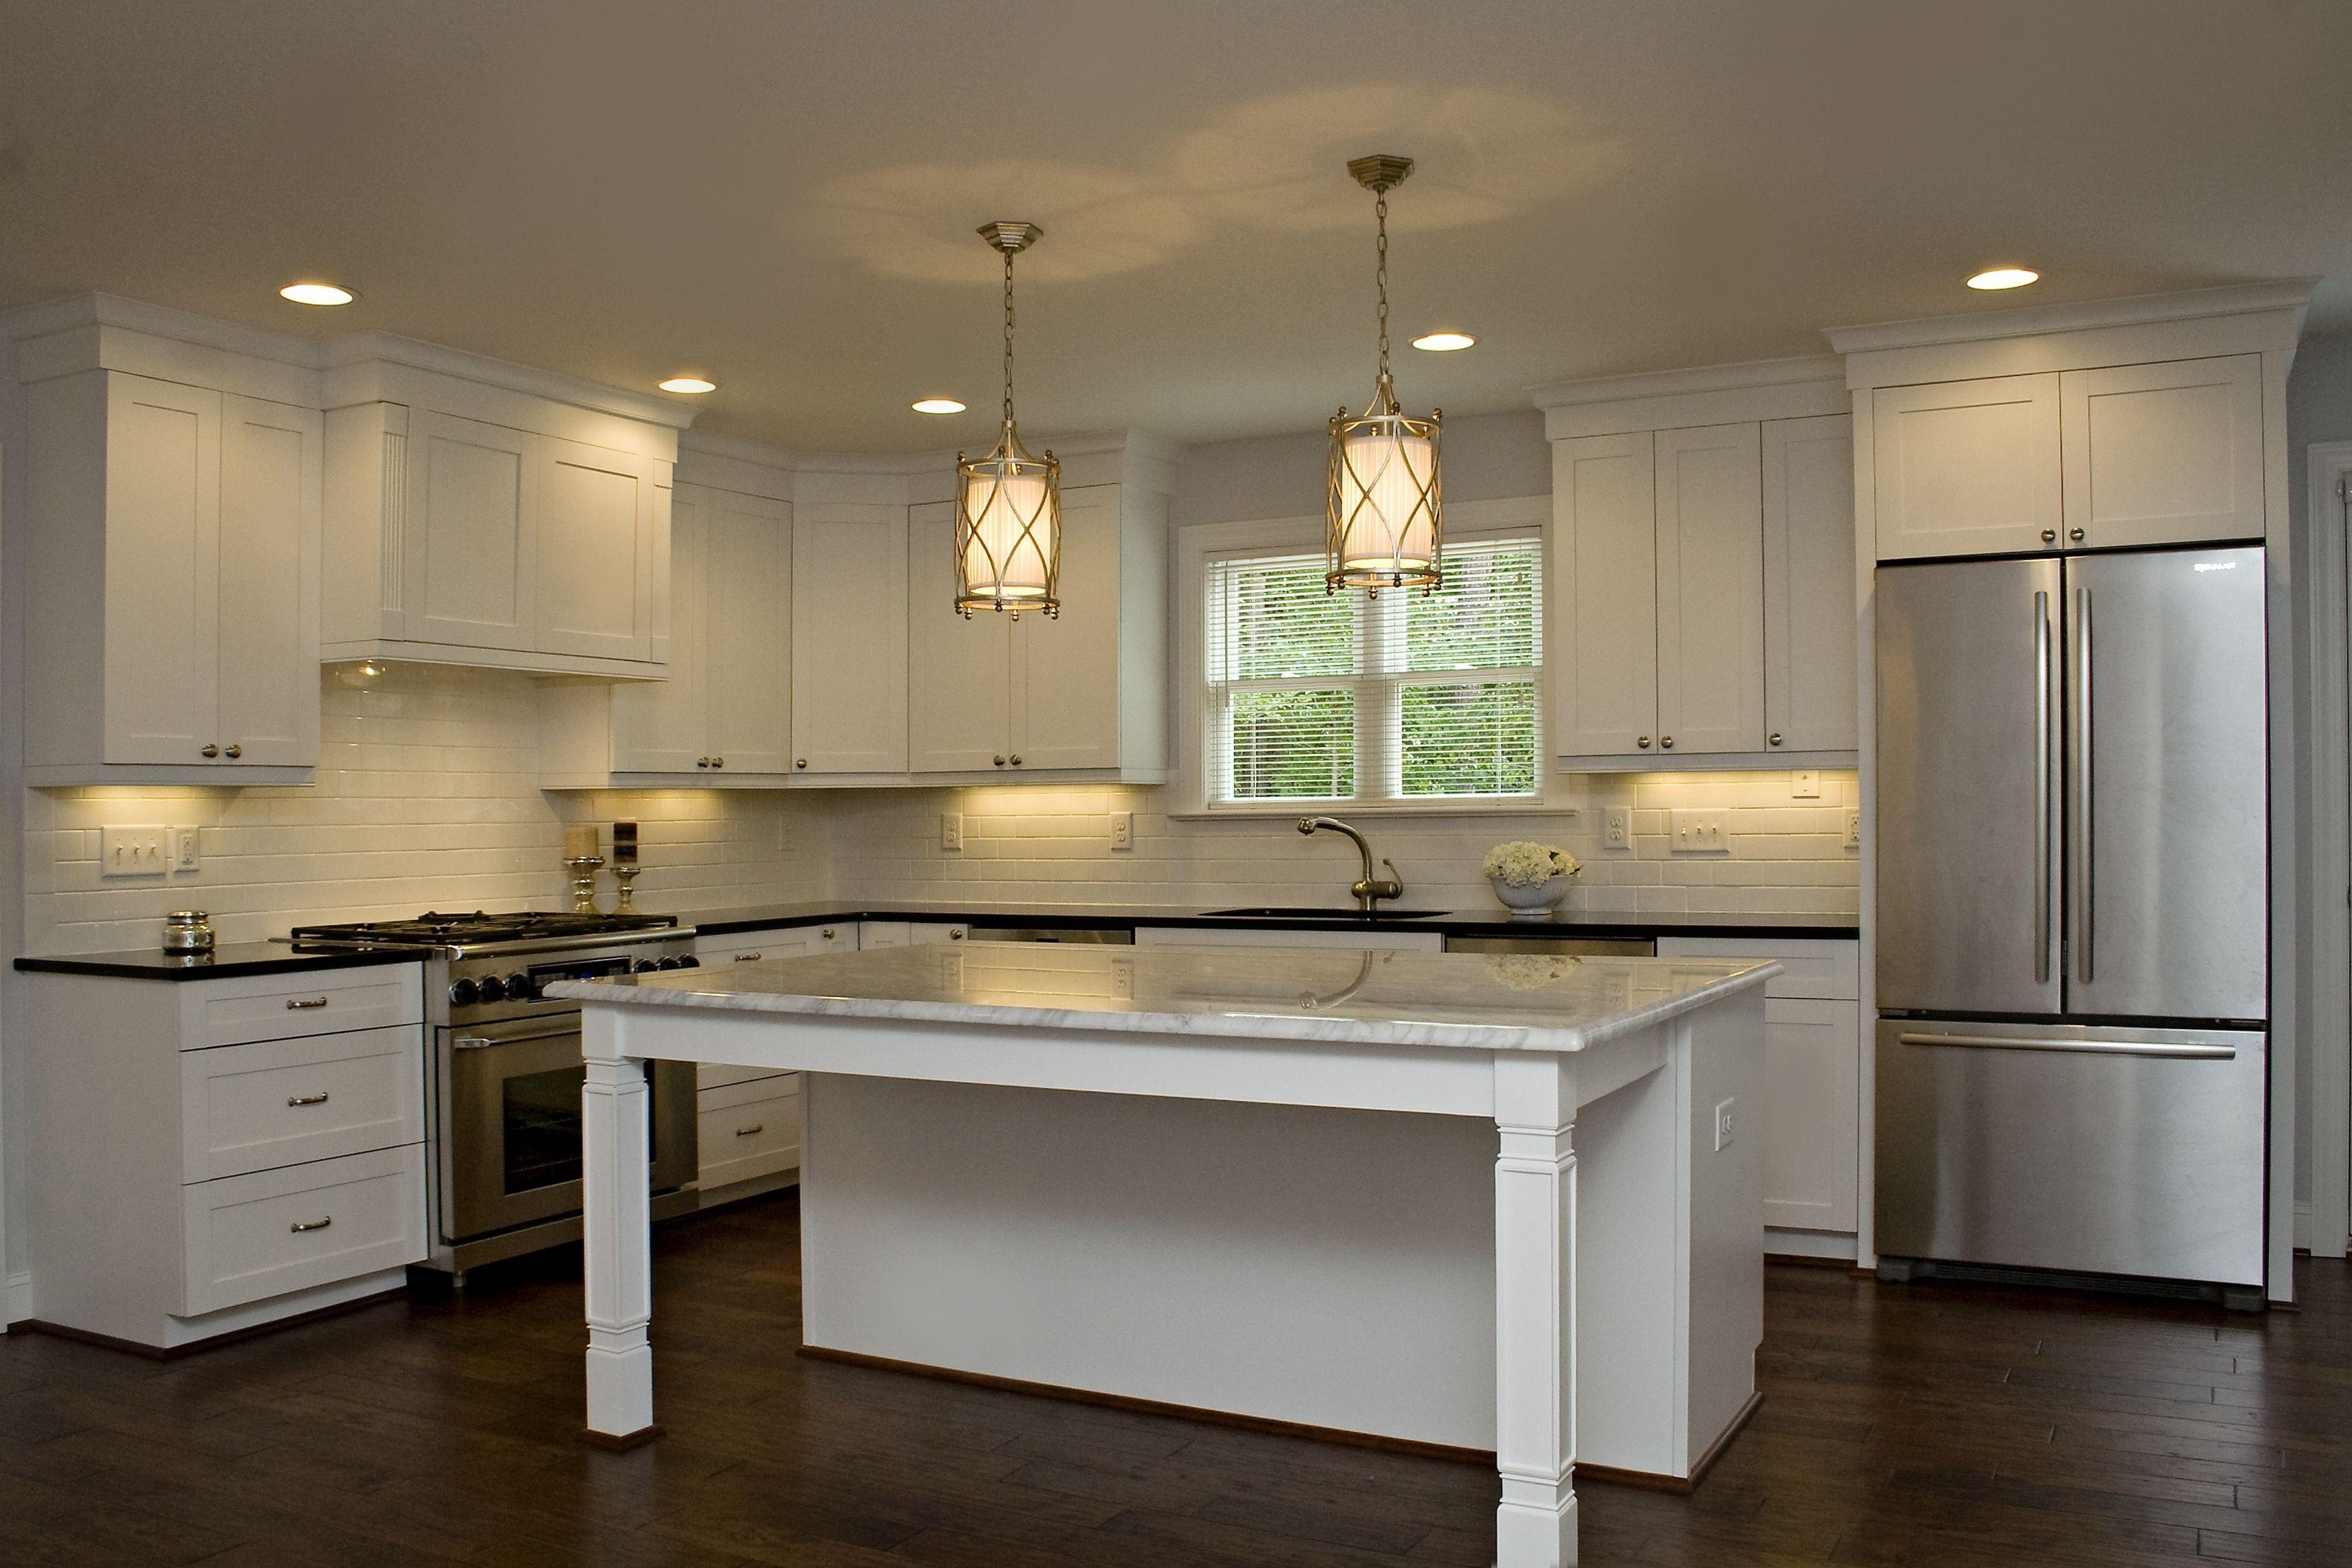 Remodeling   White modern kitchen, White kitchen ...